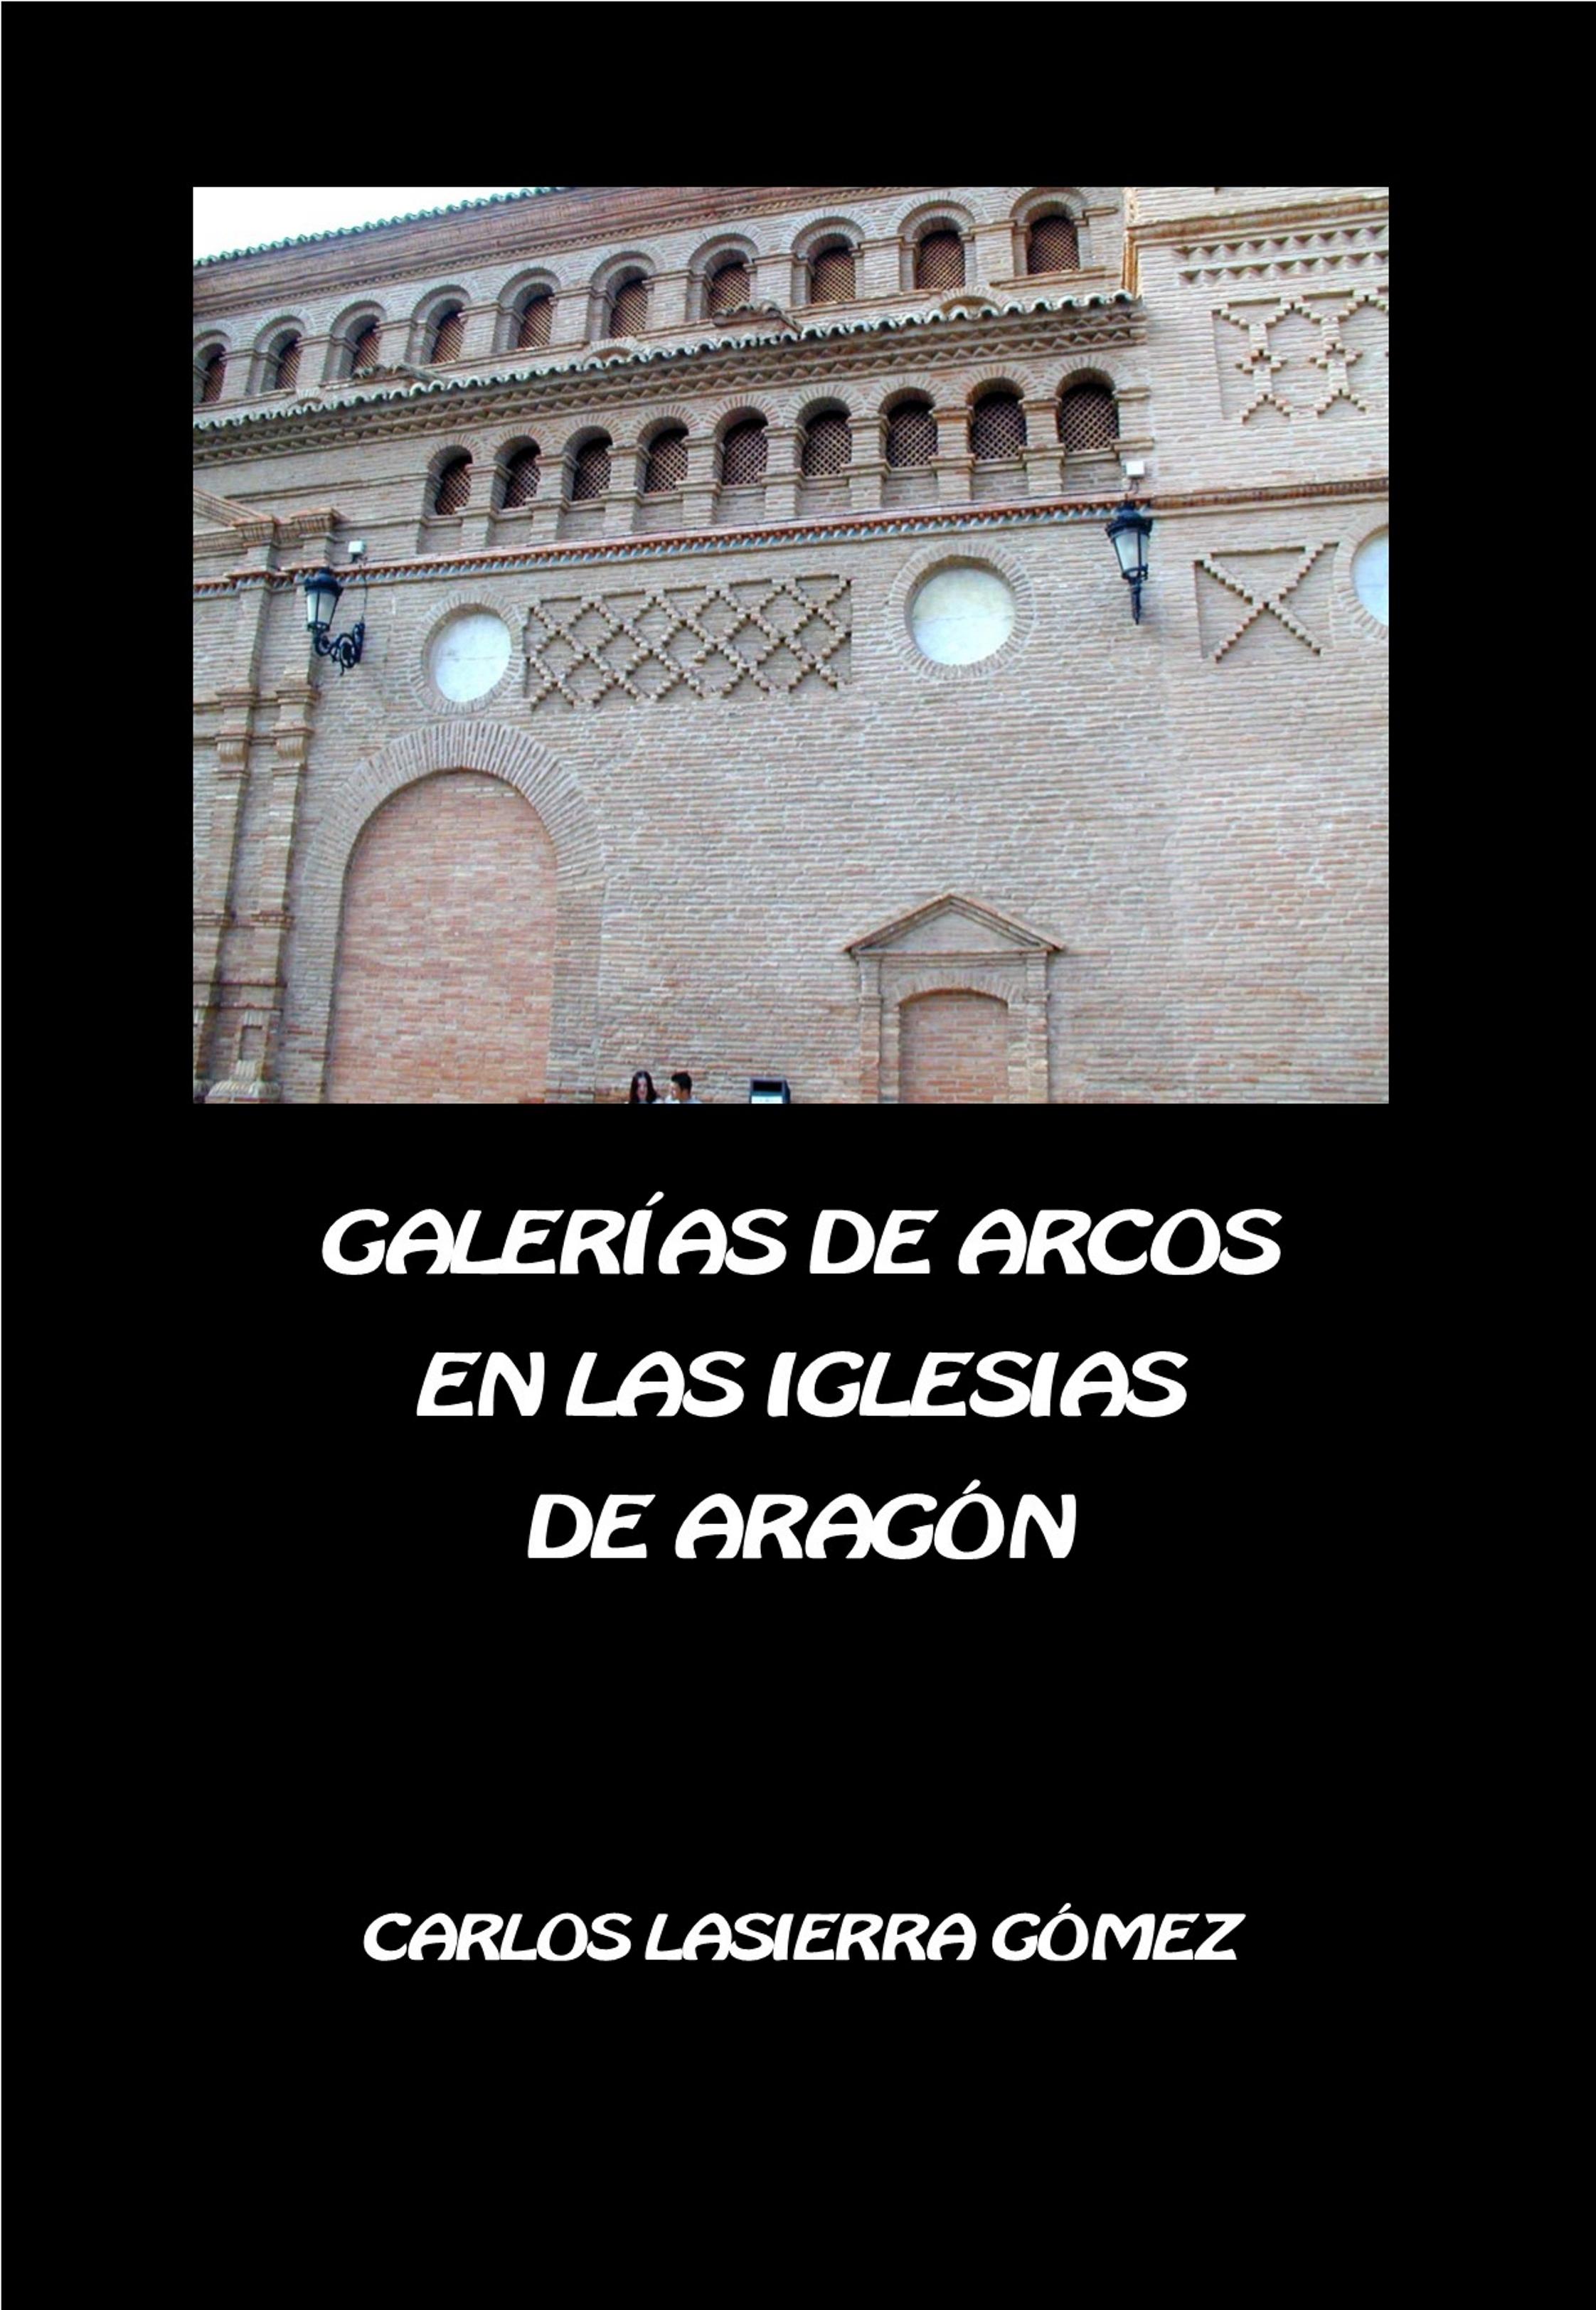 Galerías de arcos en iglesias de Ara